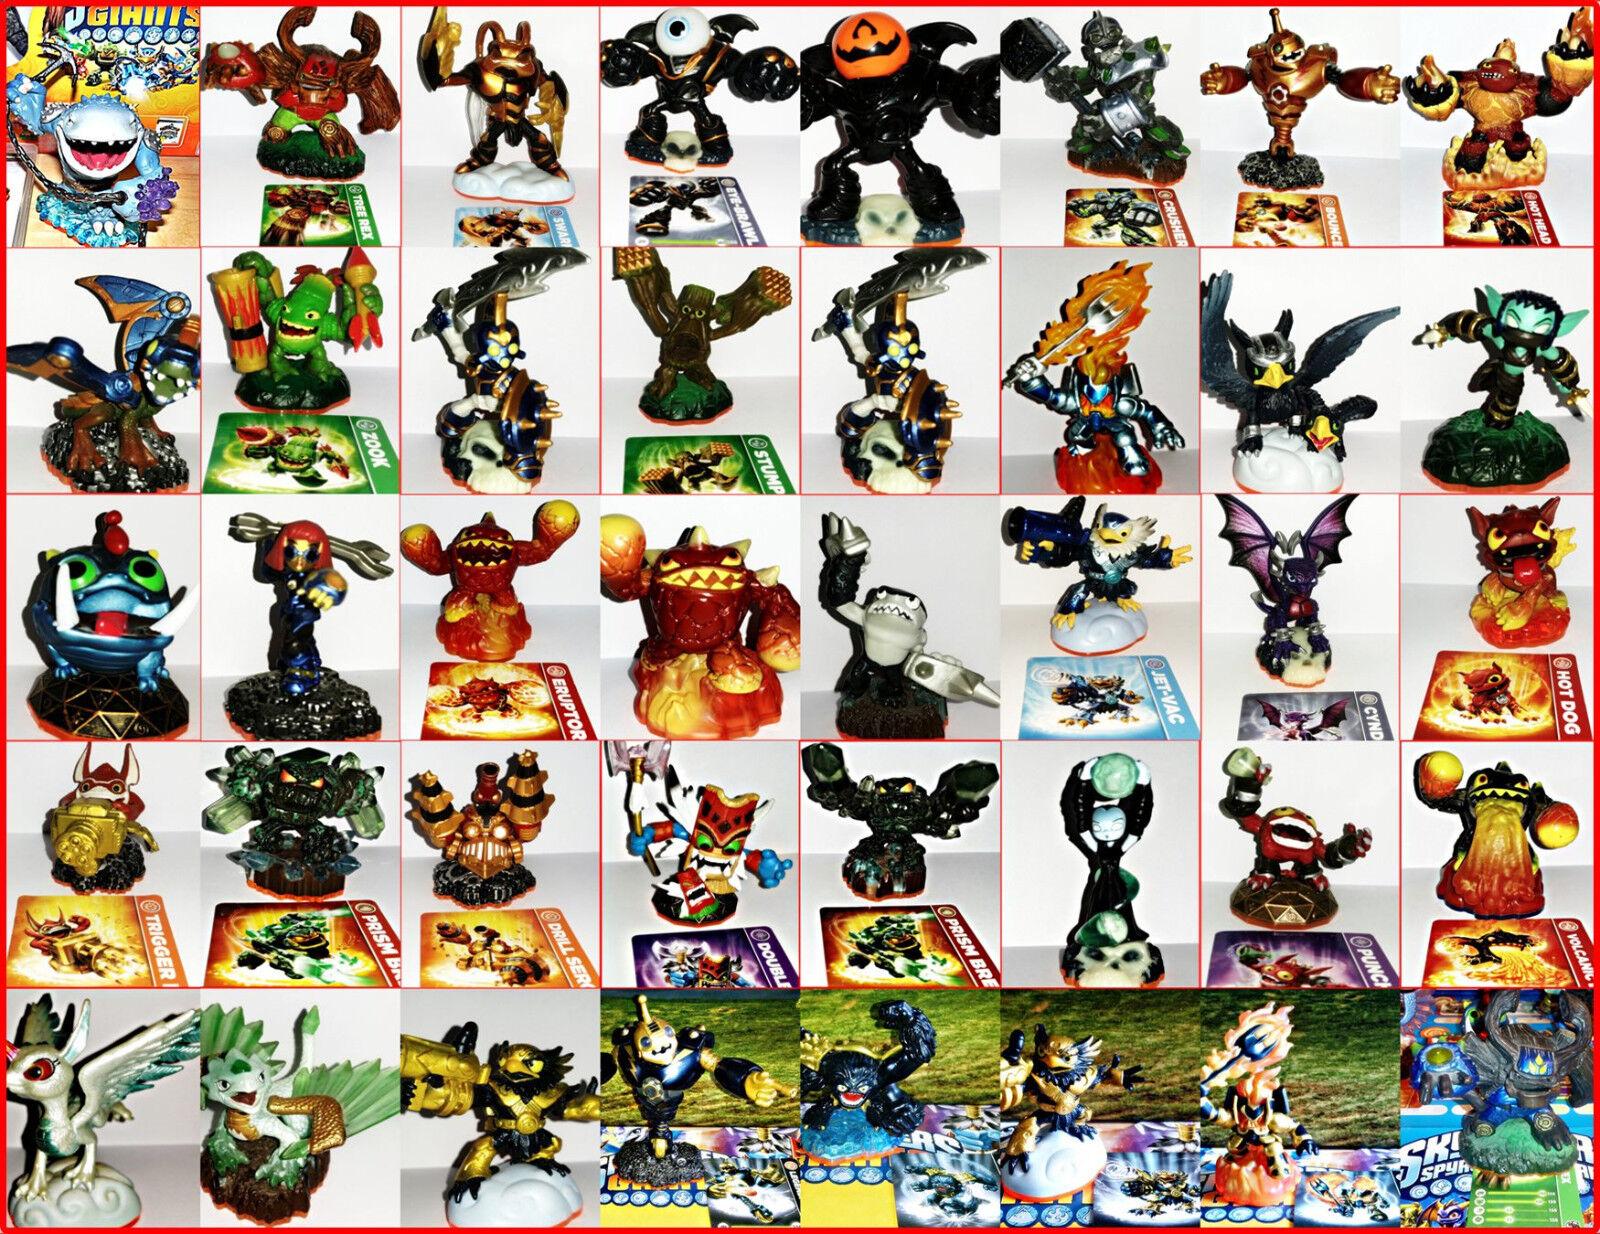 Skylanders Giants Modellini Selezione per: Ps3, Ps4, Xbox, Wii, Dsi, U, Elite,